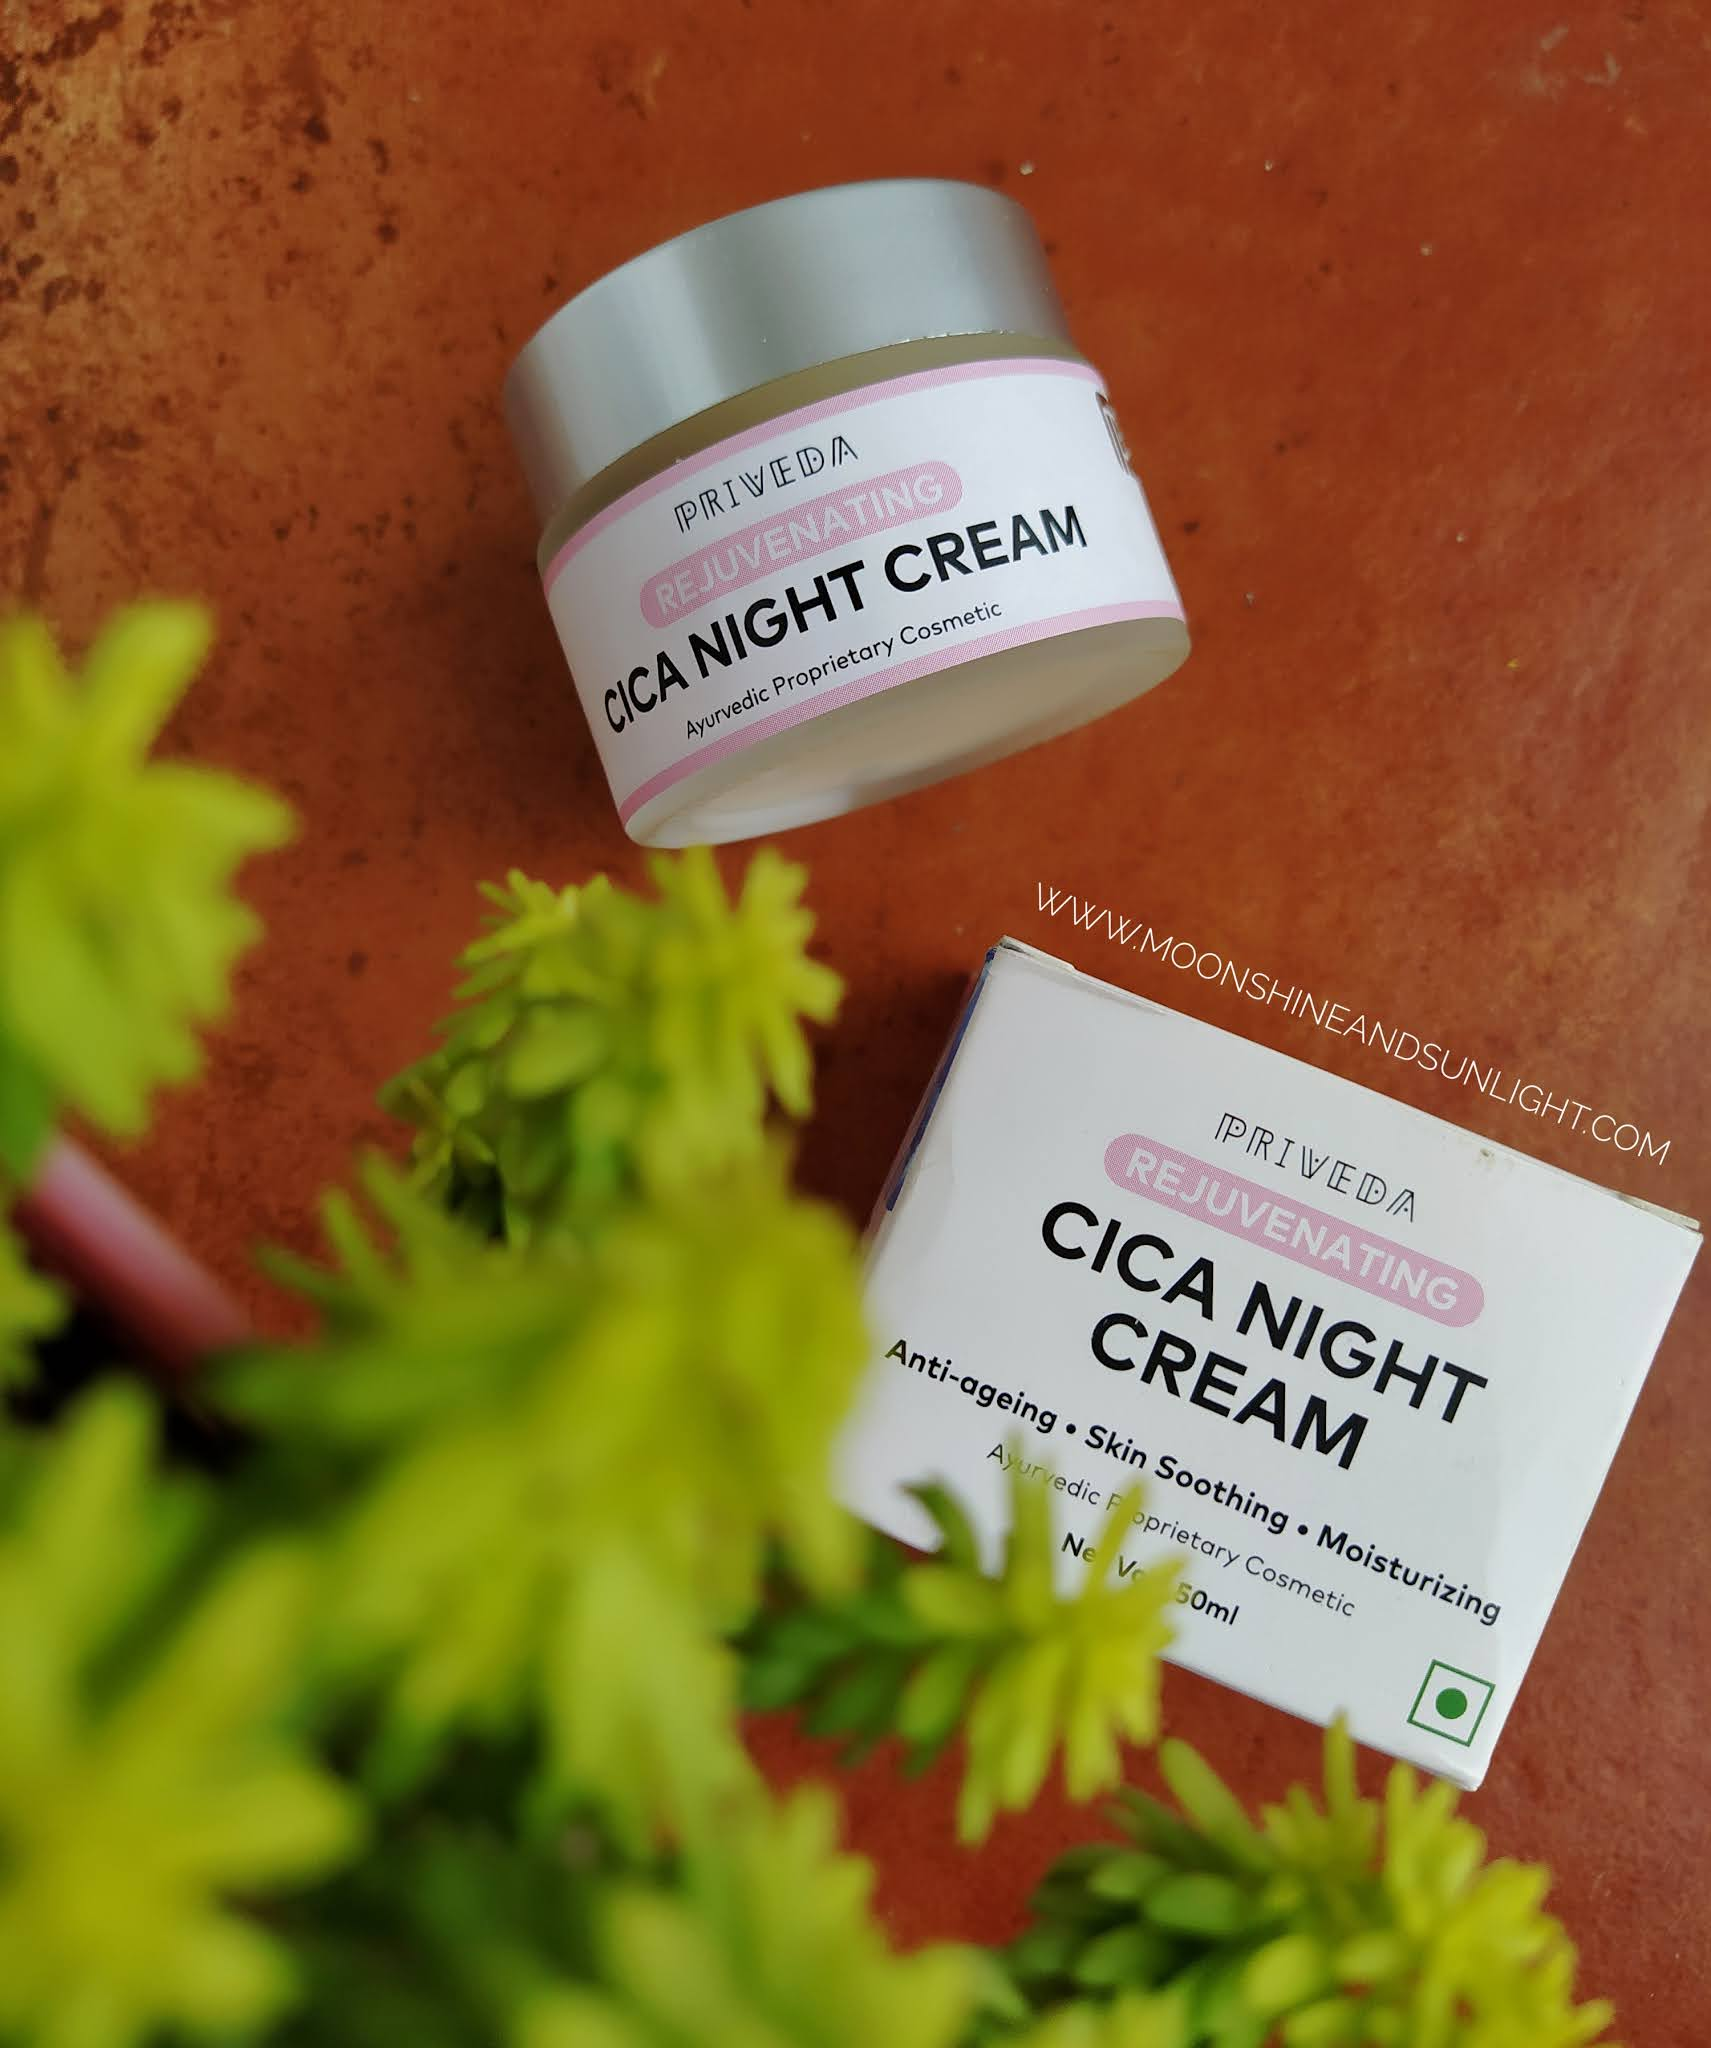 priveda night cream review